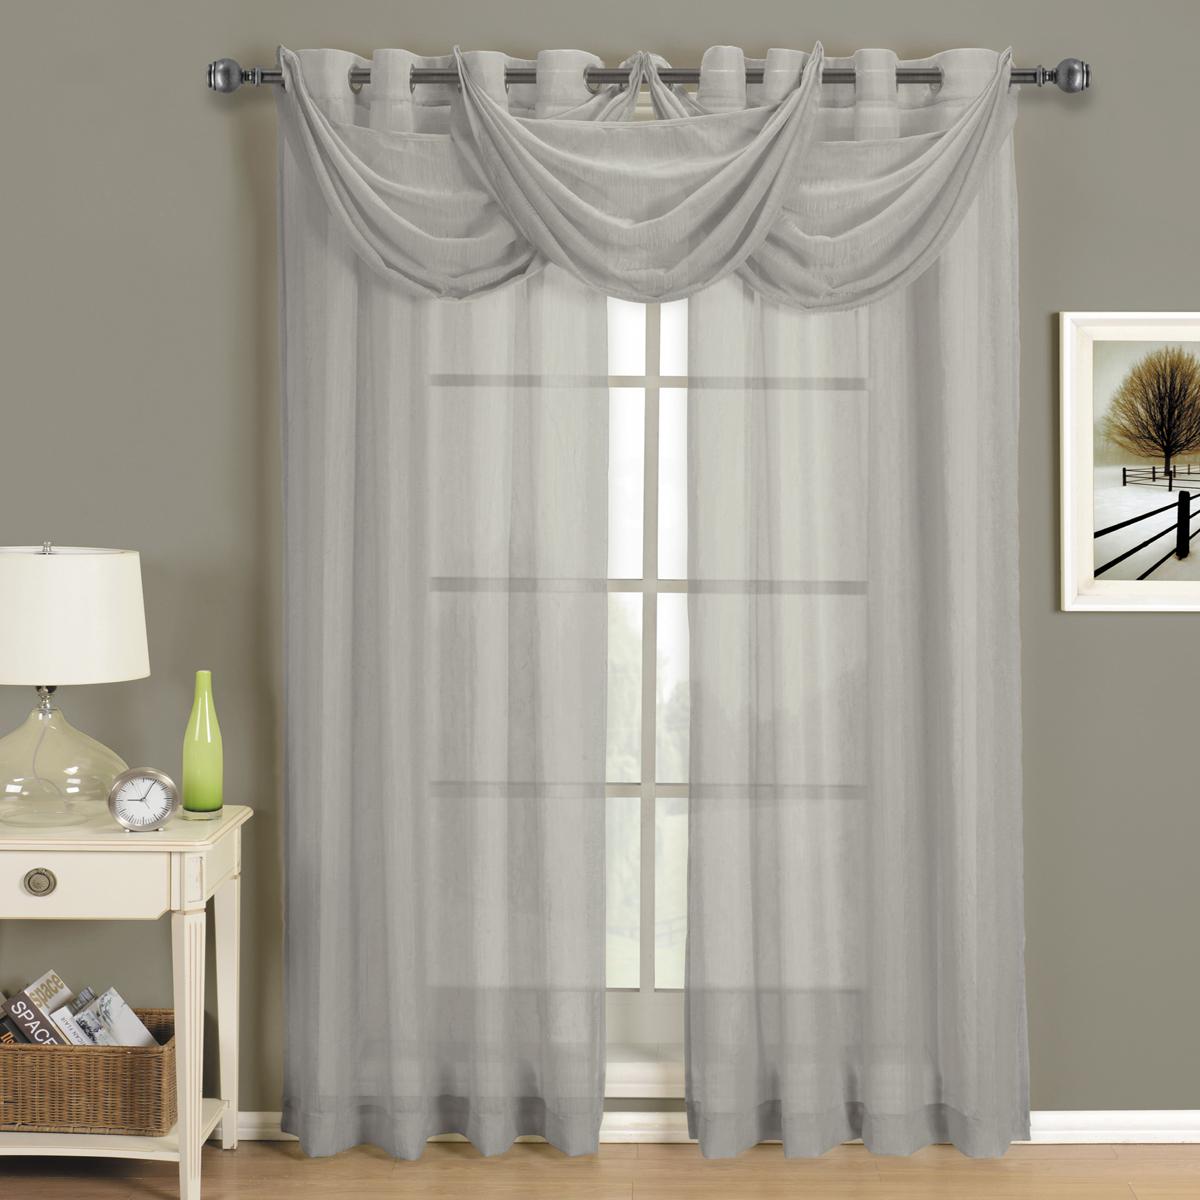 Abri Grommet Crushed Sheer Curtain Panel